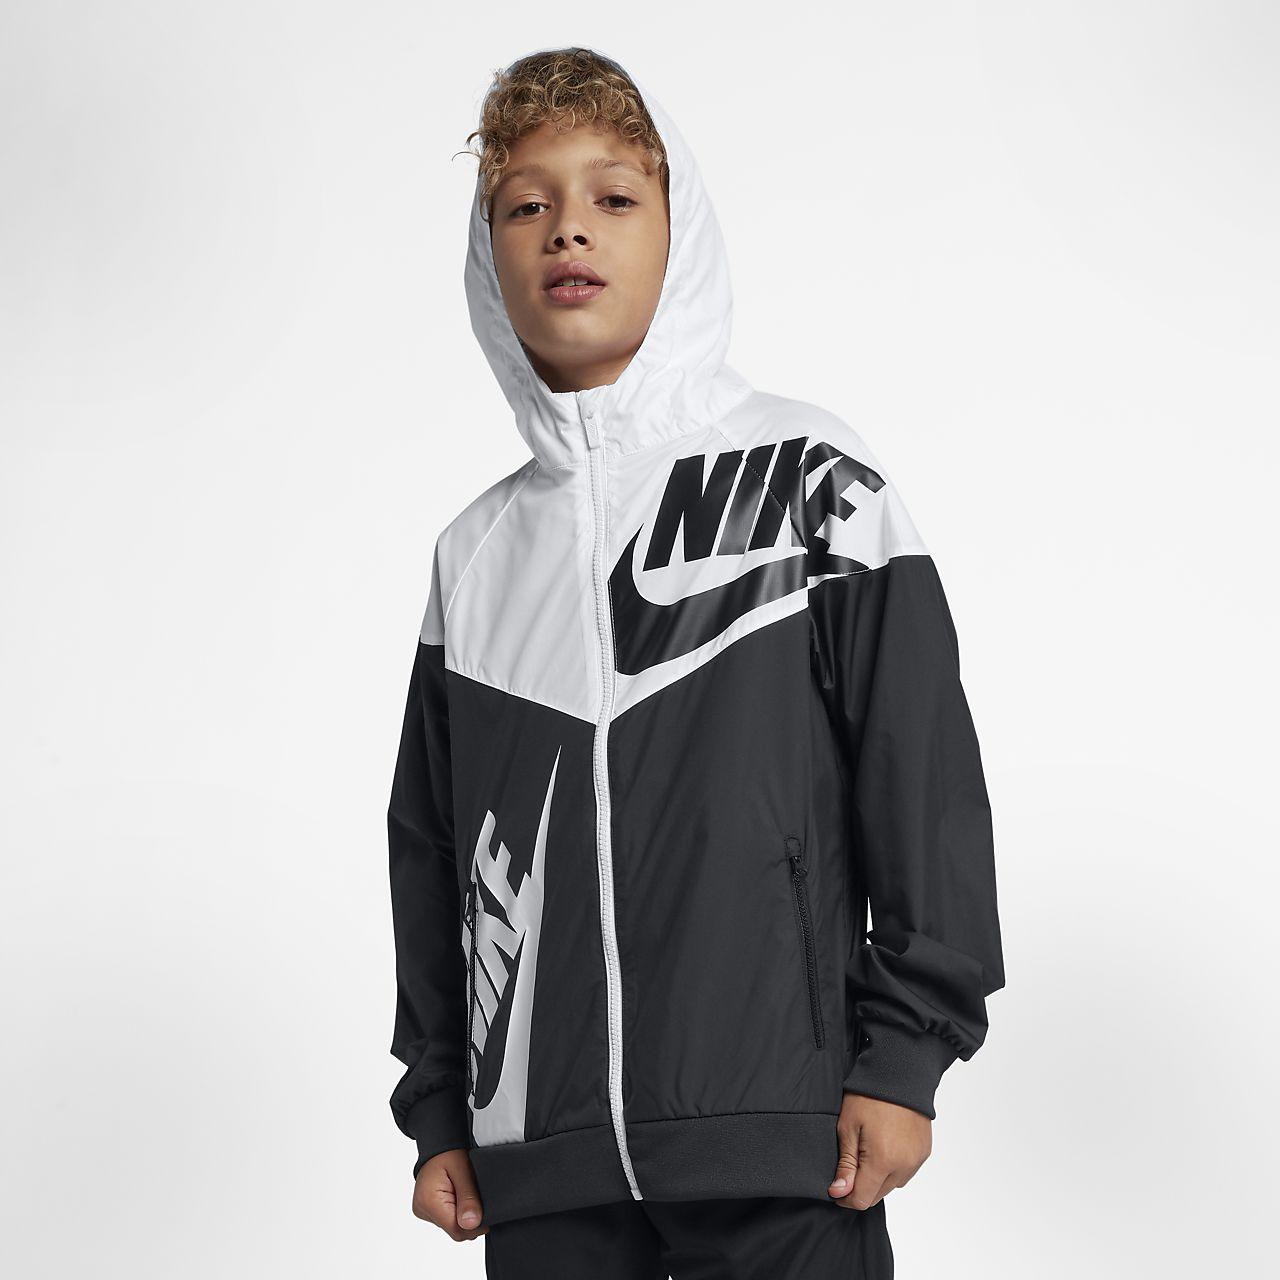 Windrunner A Ragazzo Giacca Nike Vento Sportswear qAHqpzIwg